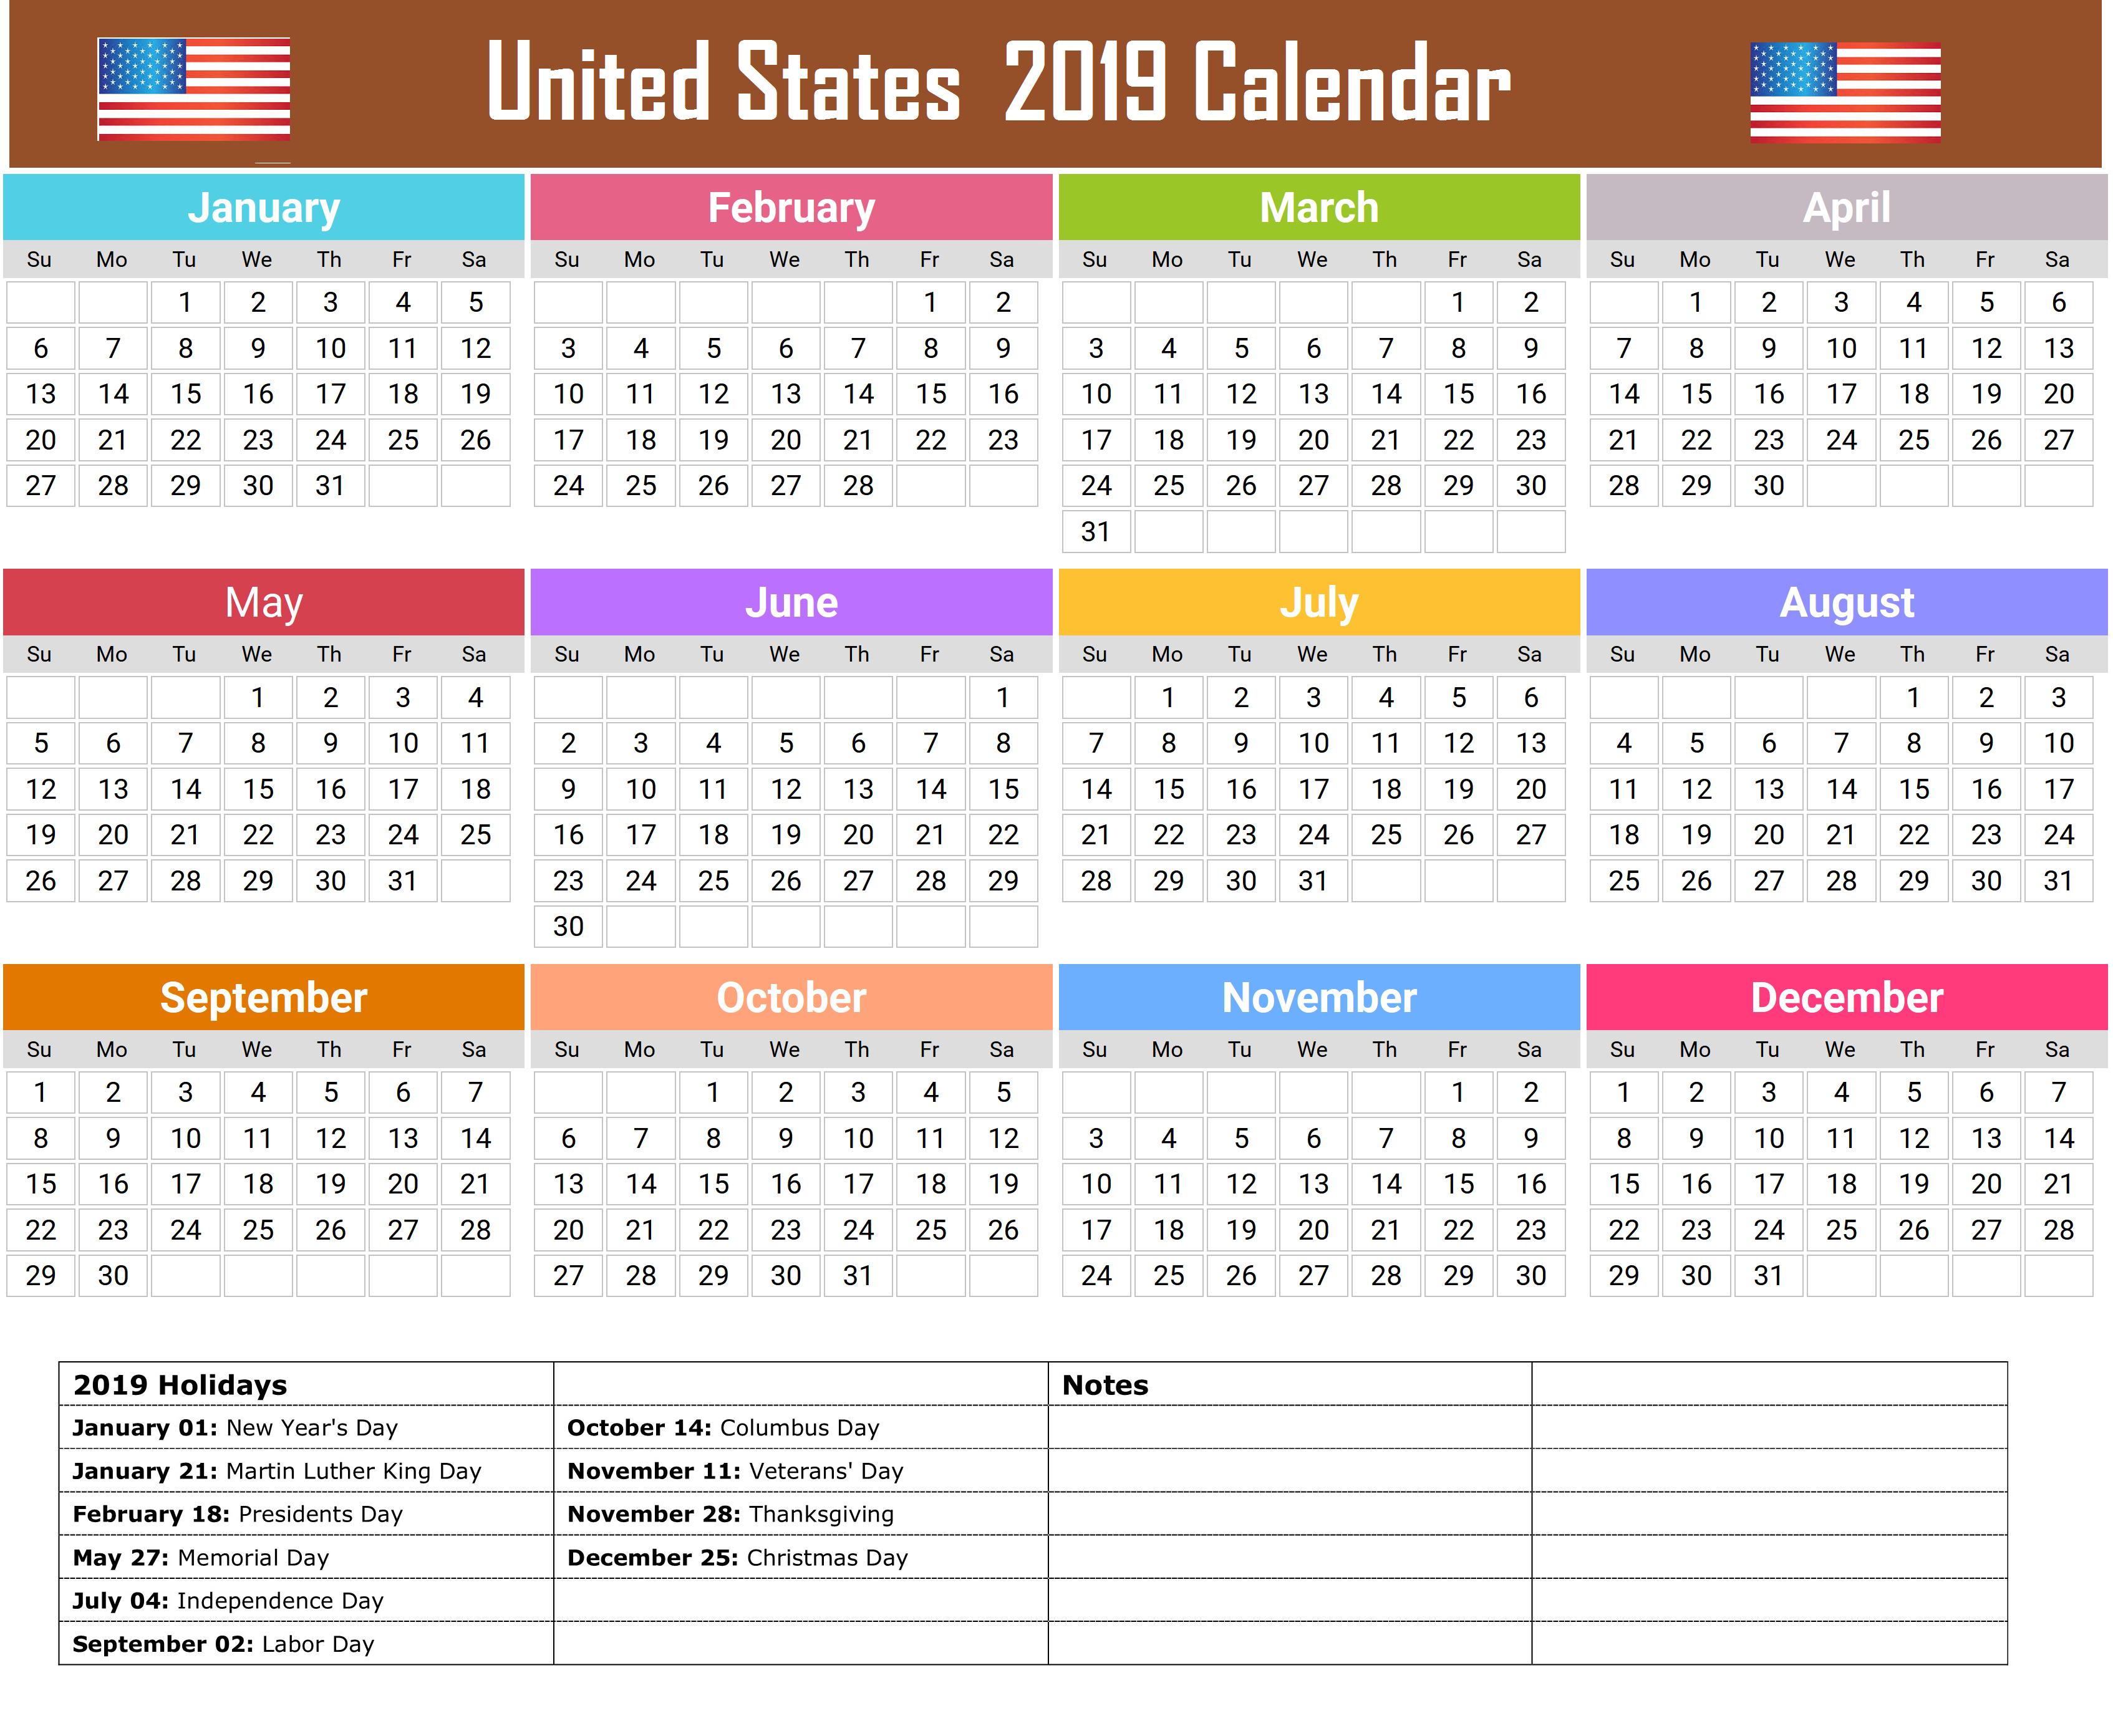 united states 2019 holidays calendar